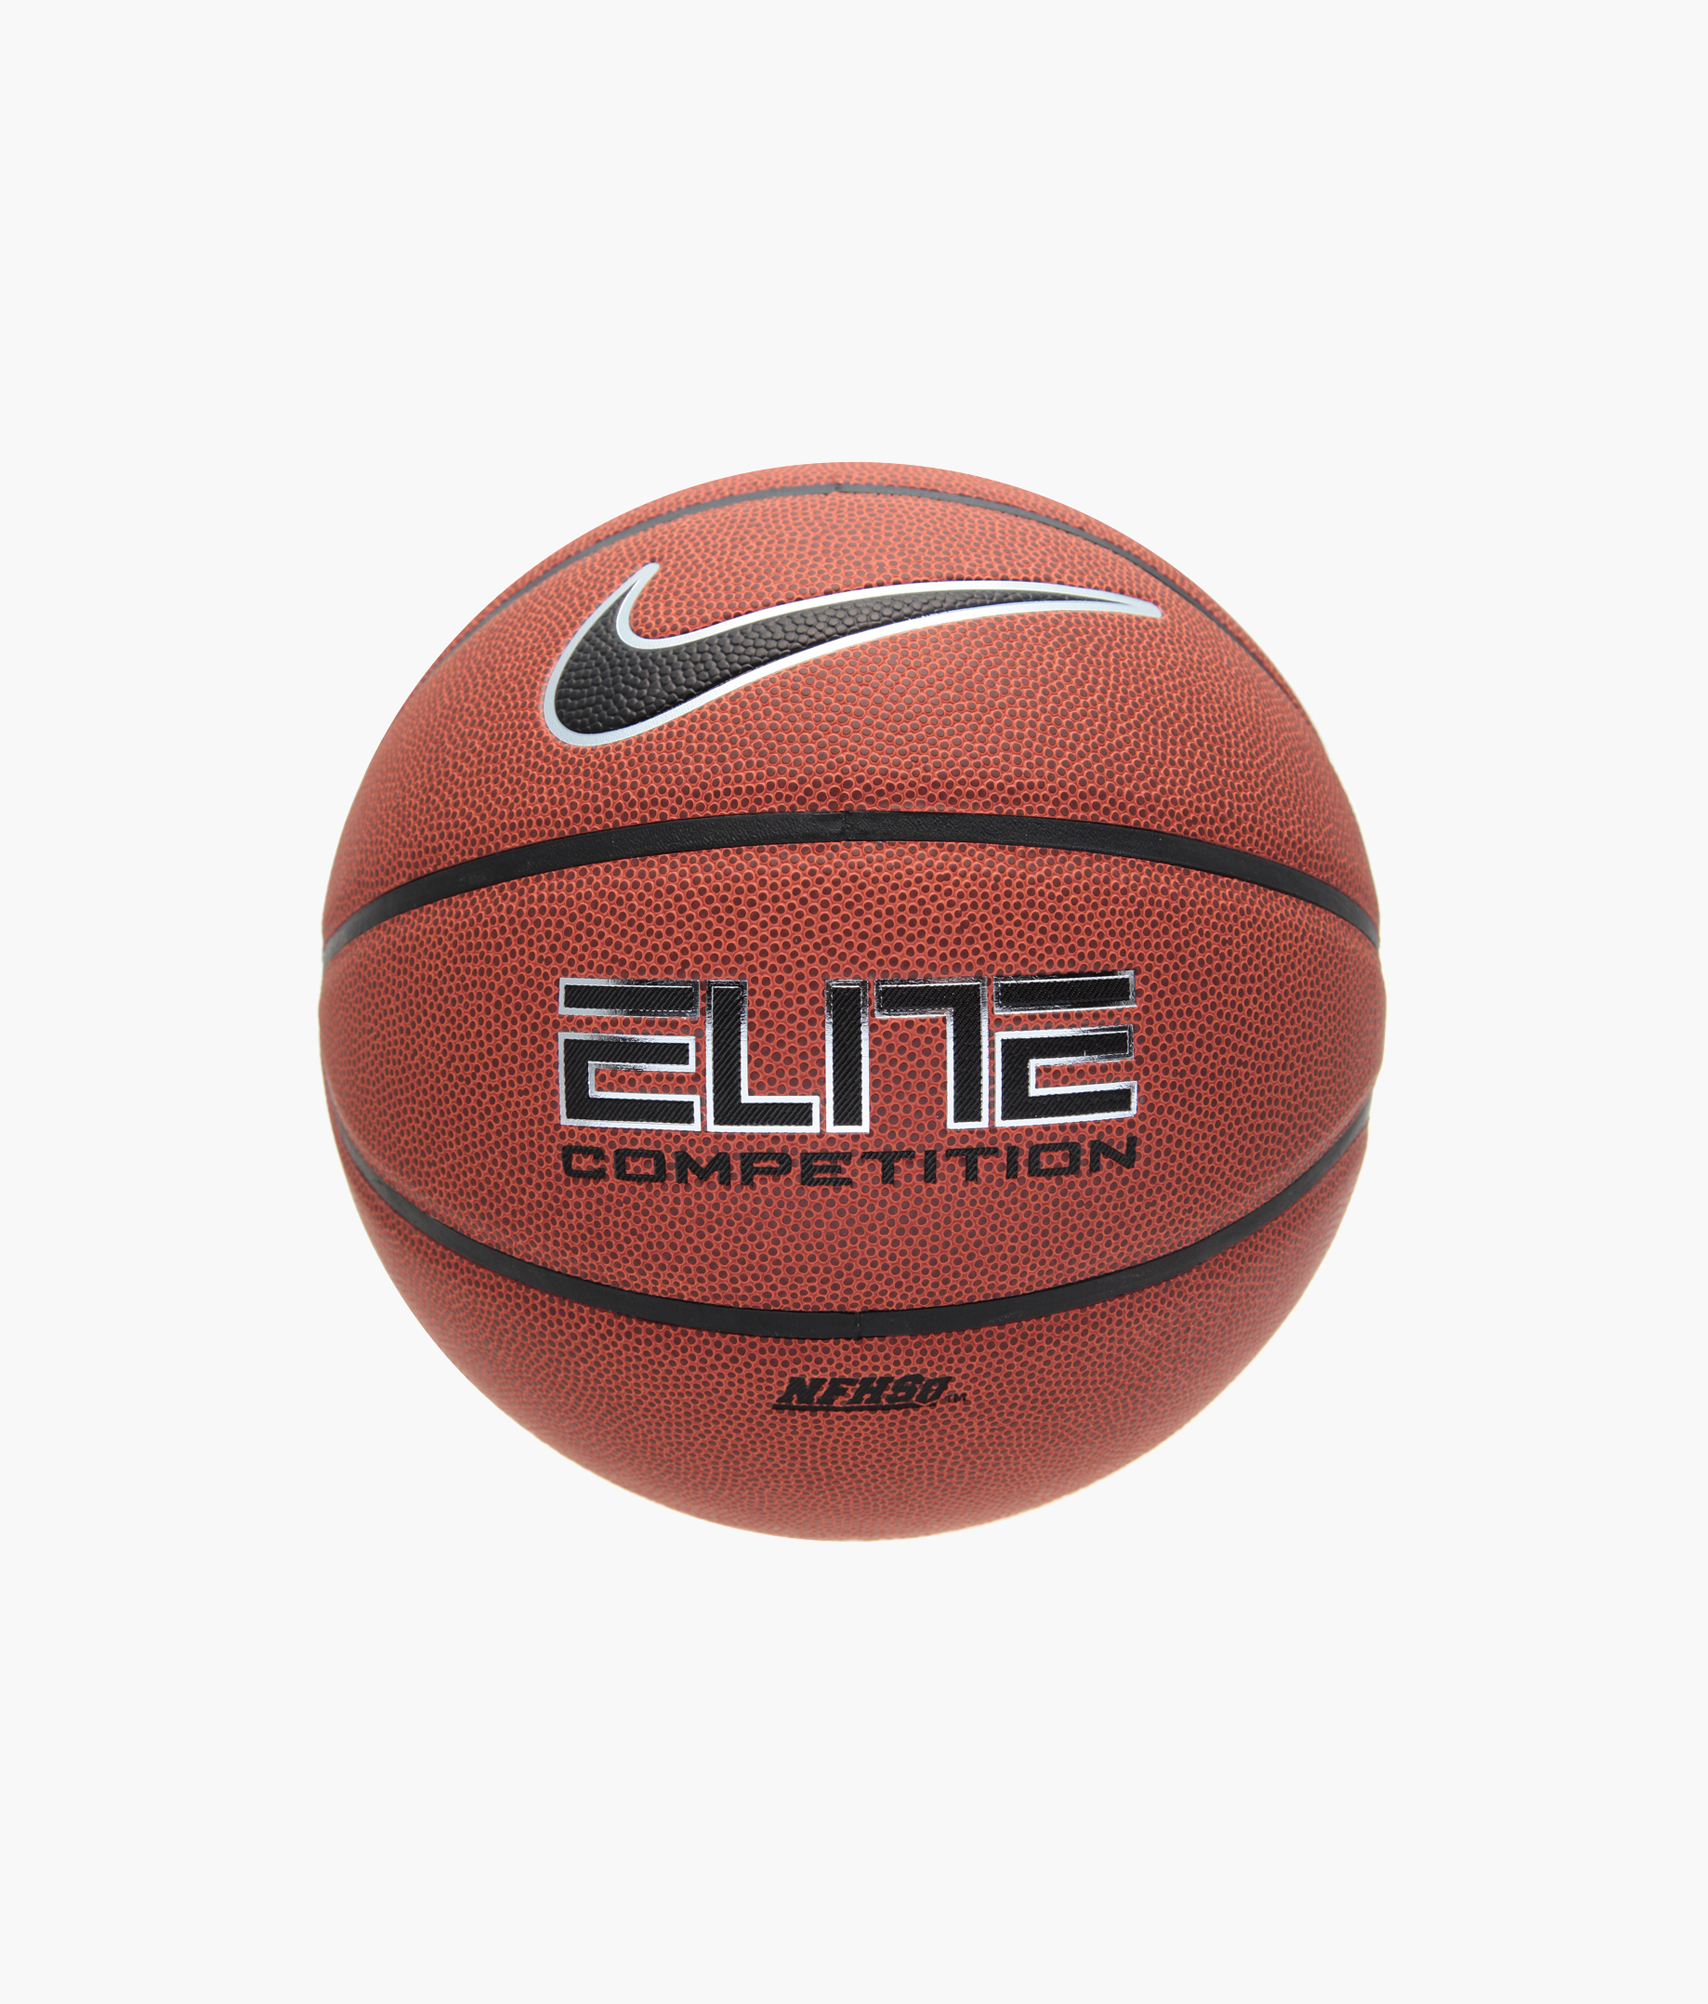 Мяч баскетбольный Nike Nike Цвет-Оранжевый мяч баскетбольный nike skills цвет черный желтый белый размер 3